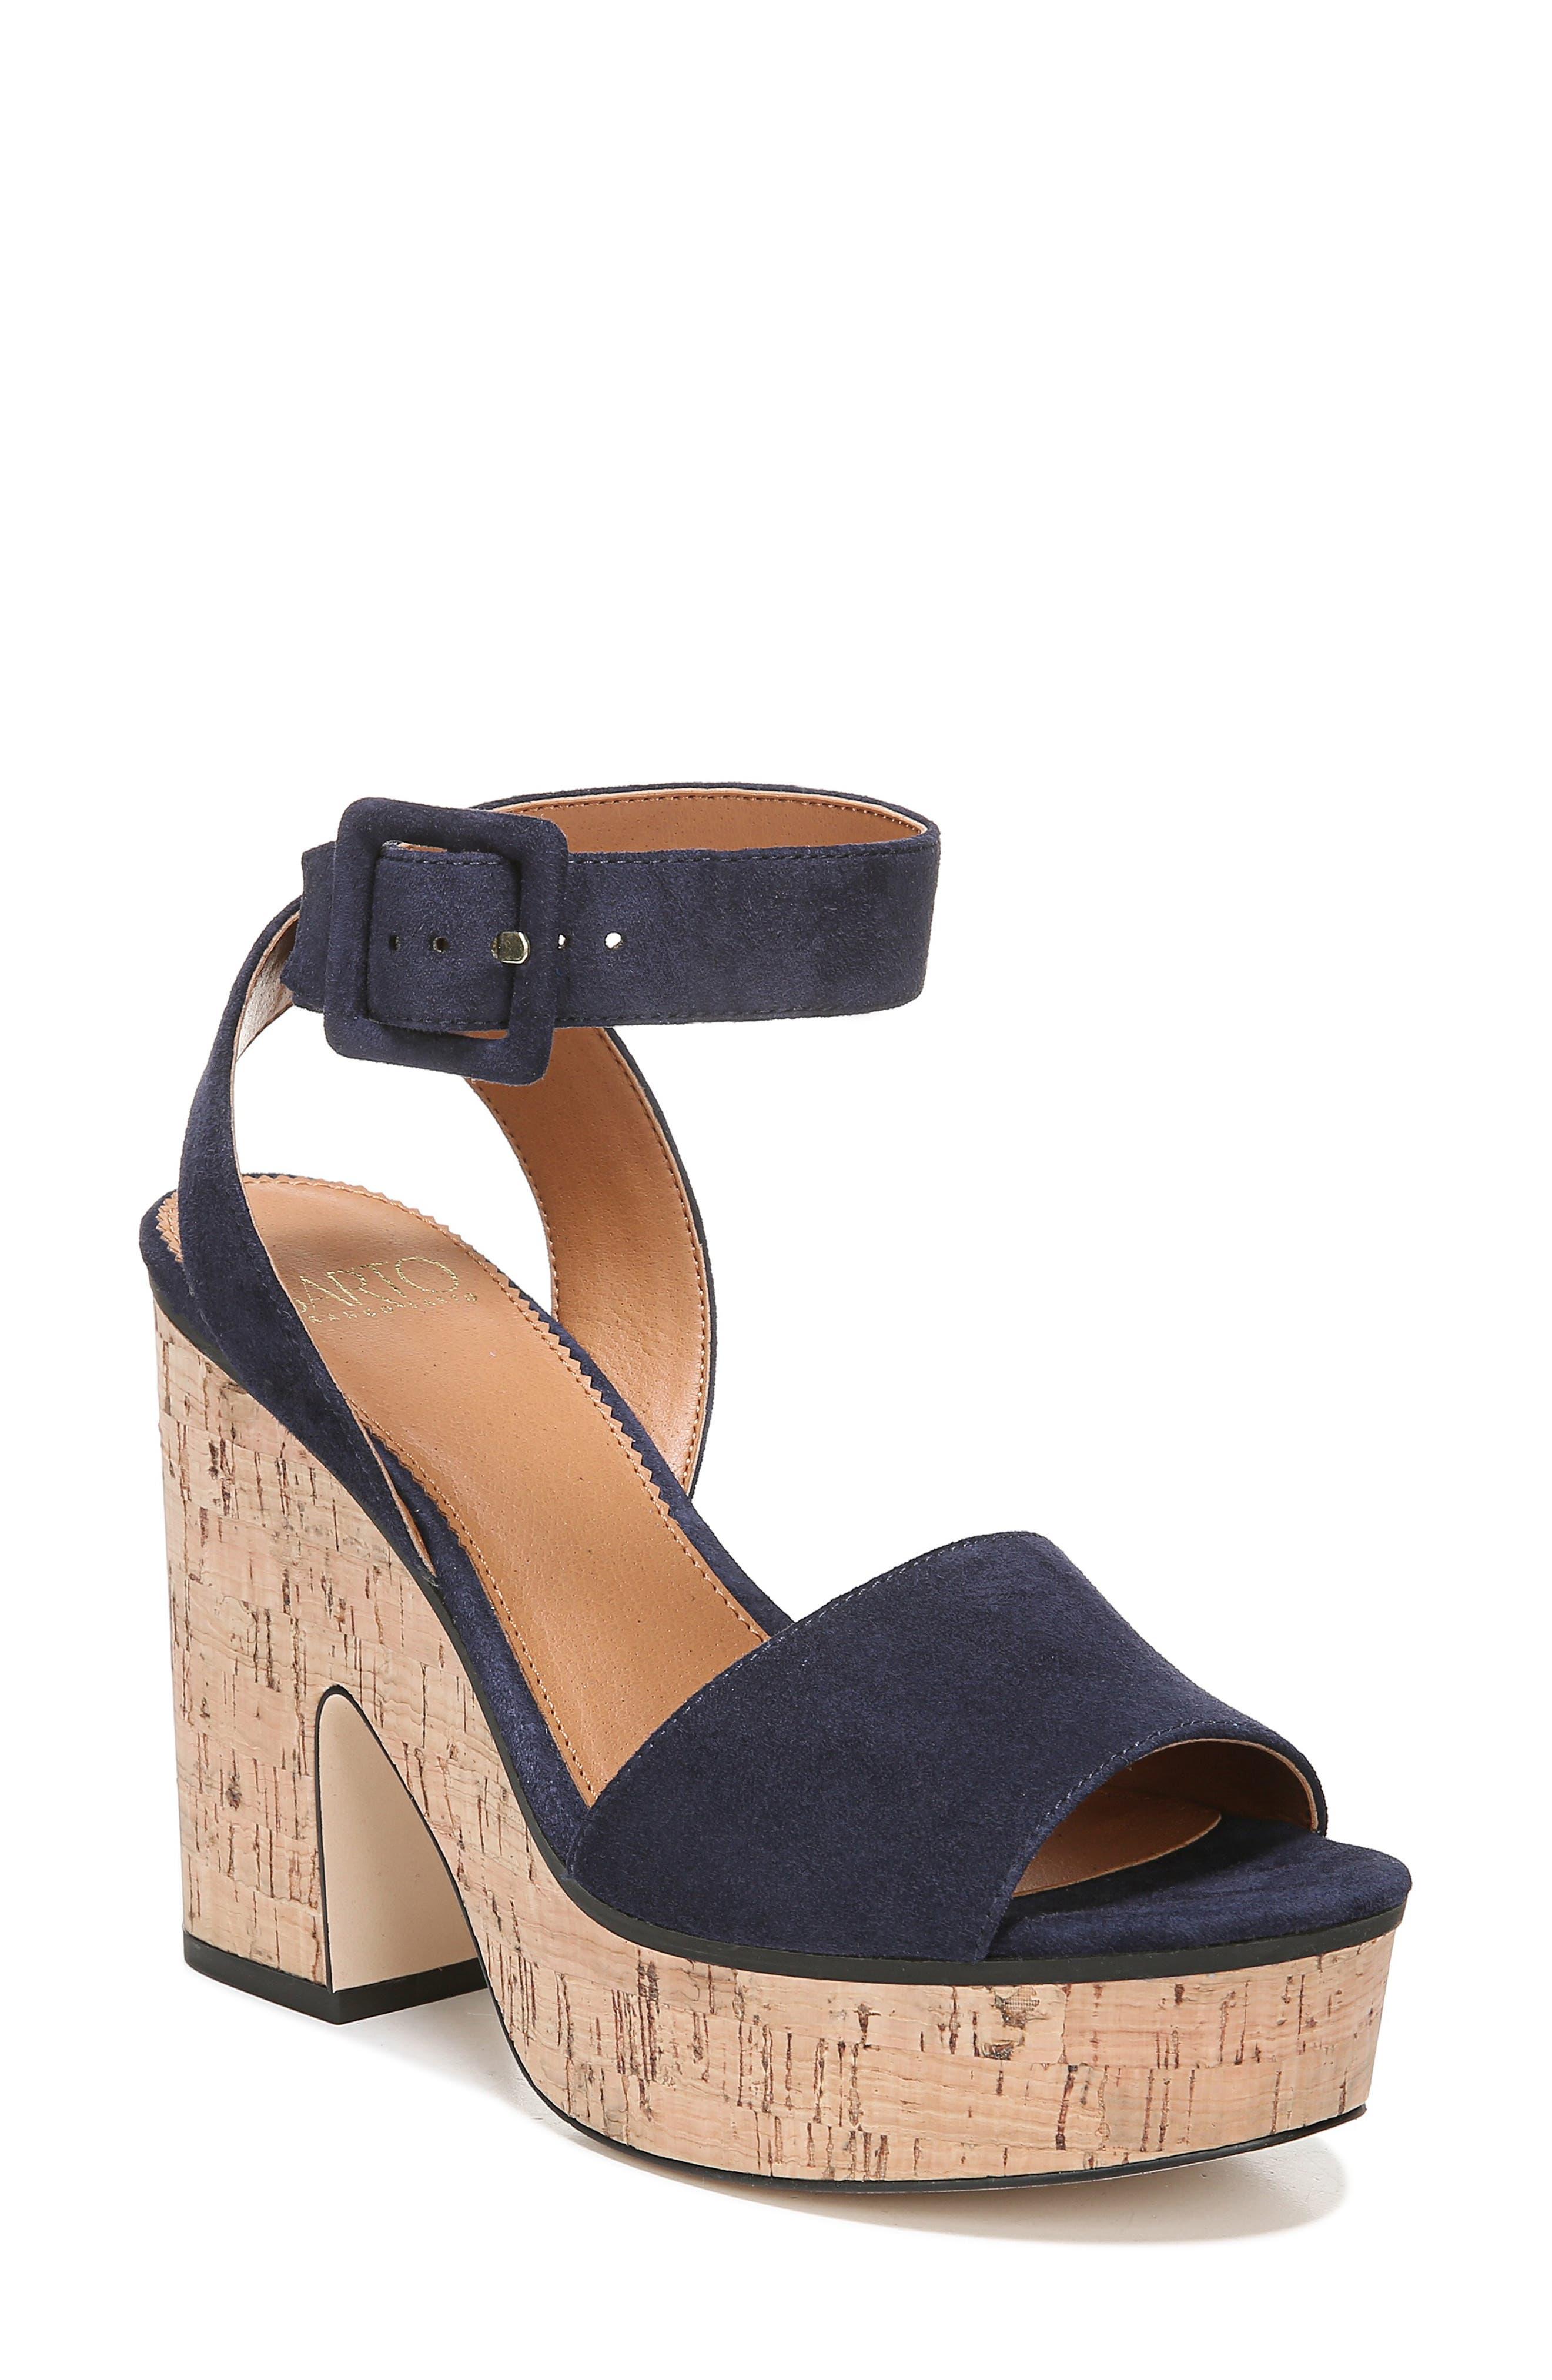 Sarto By Franco Sarto Franny Platform Sandal, Blue